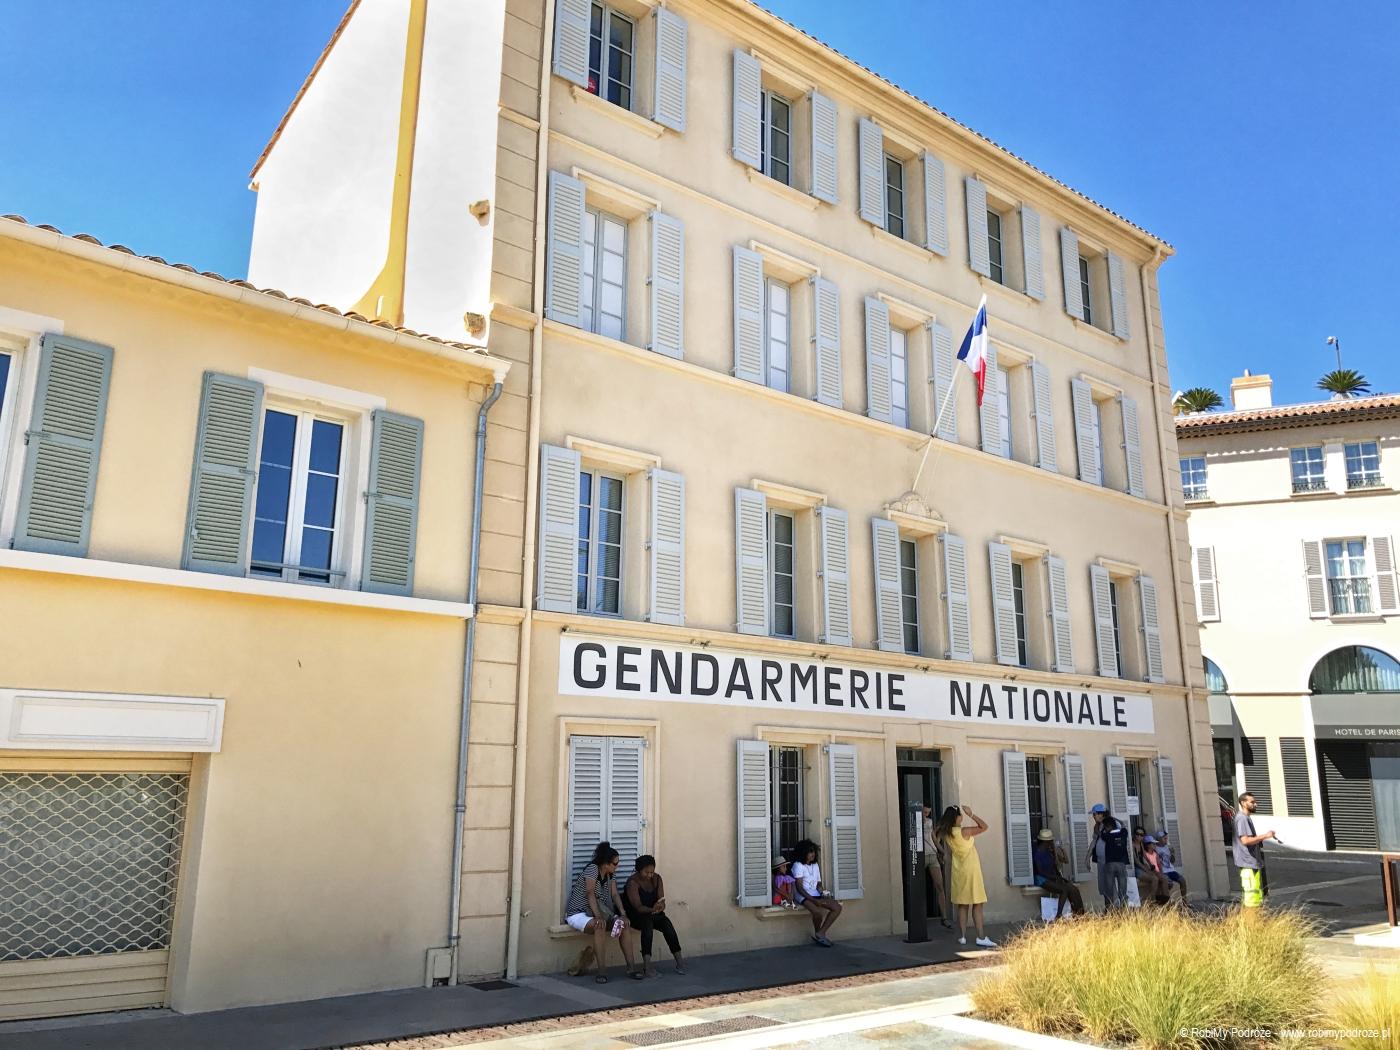 posterunek żandarma z Saint-Tropez